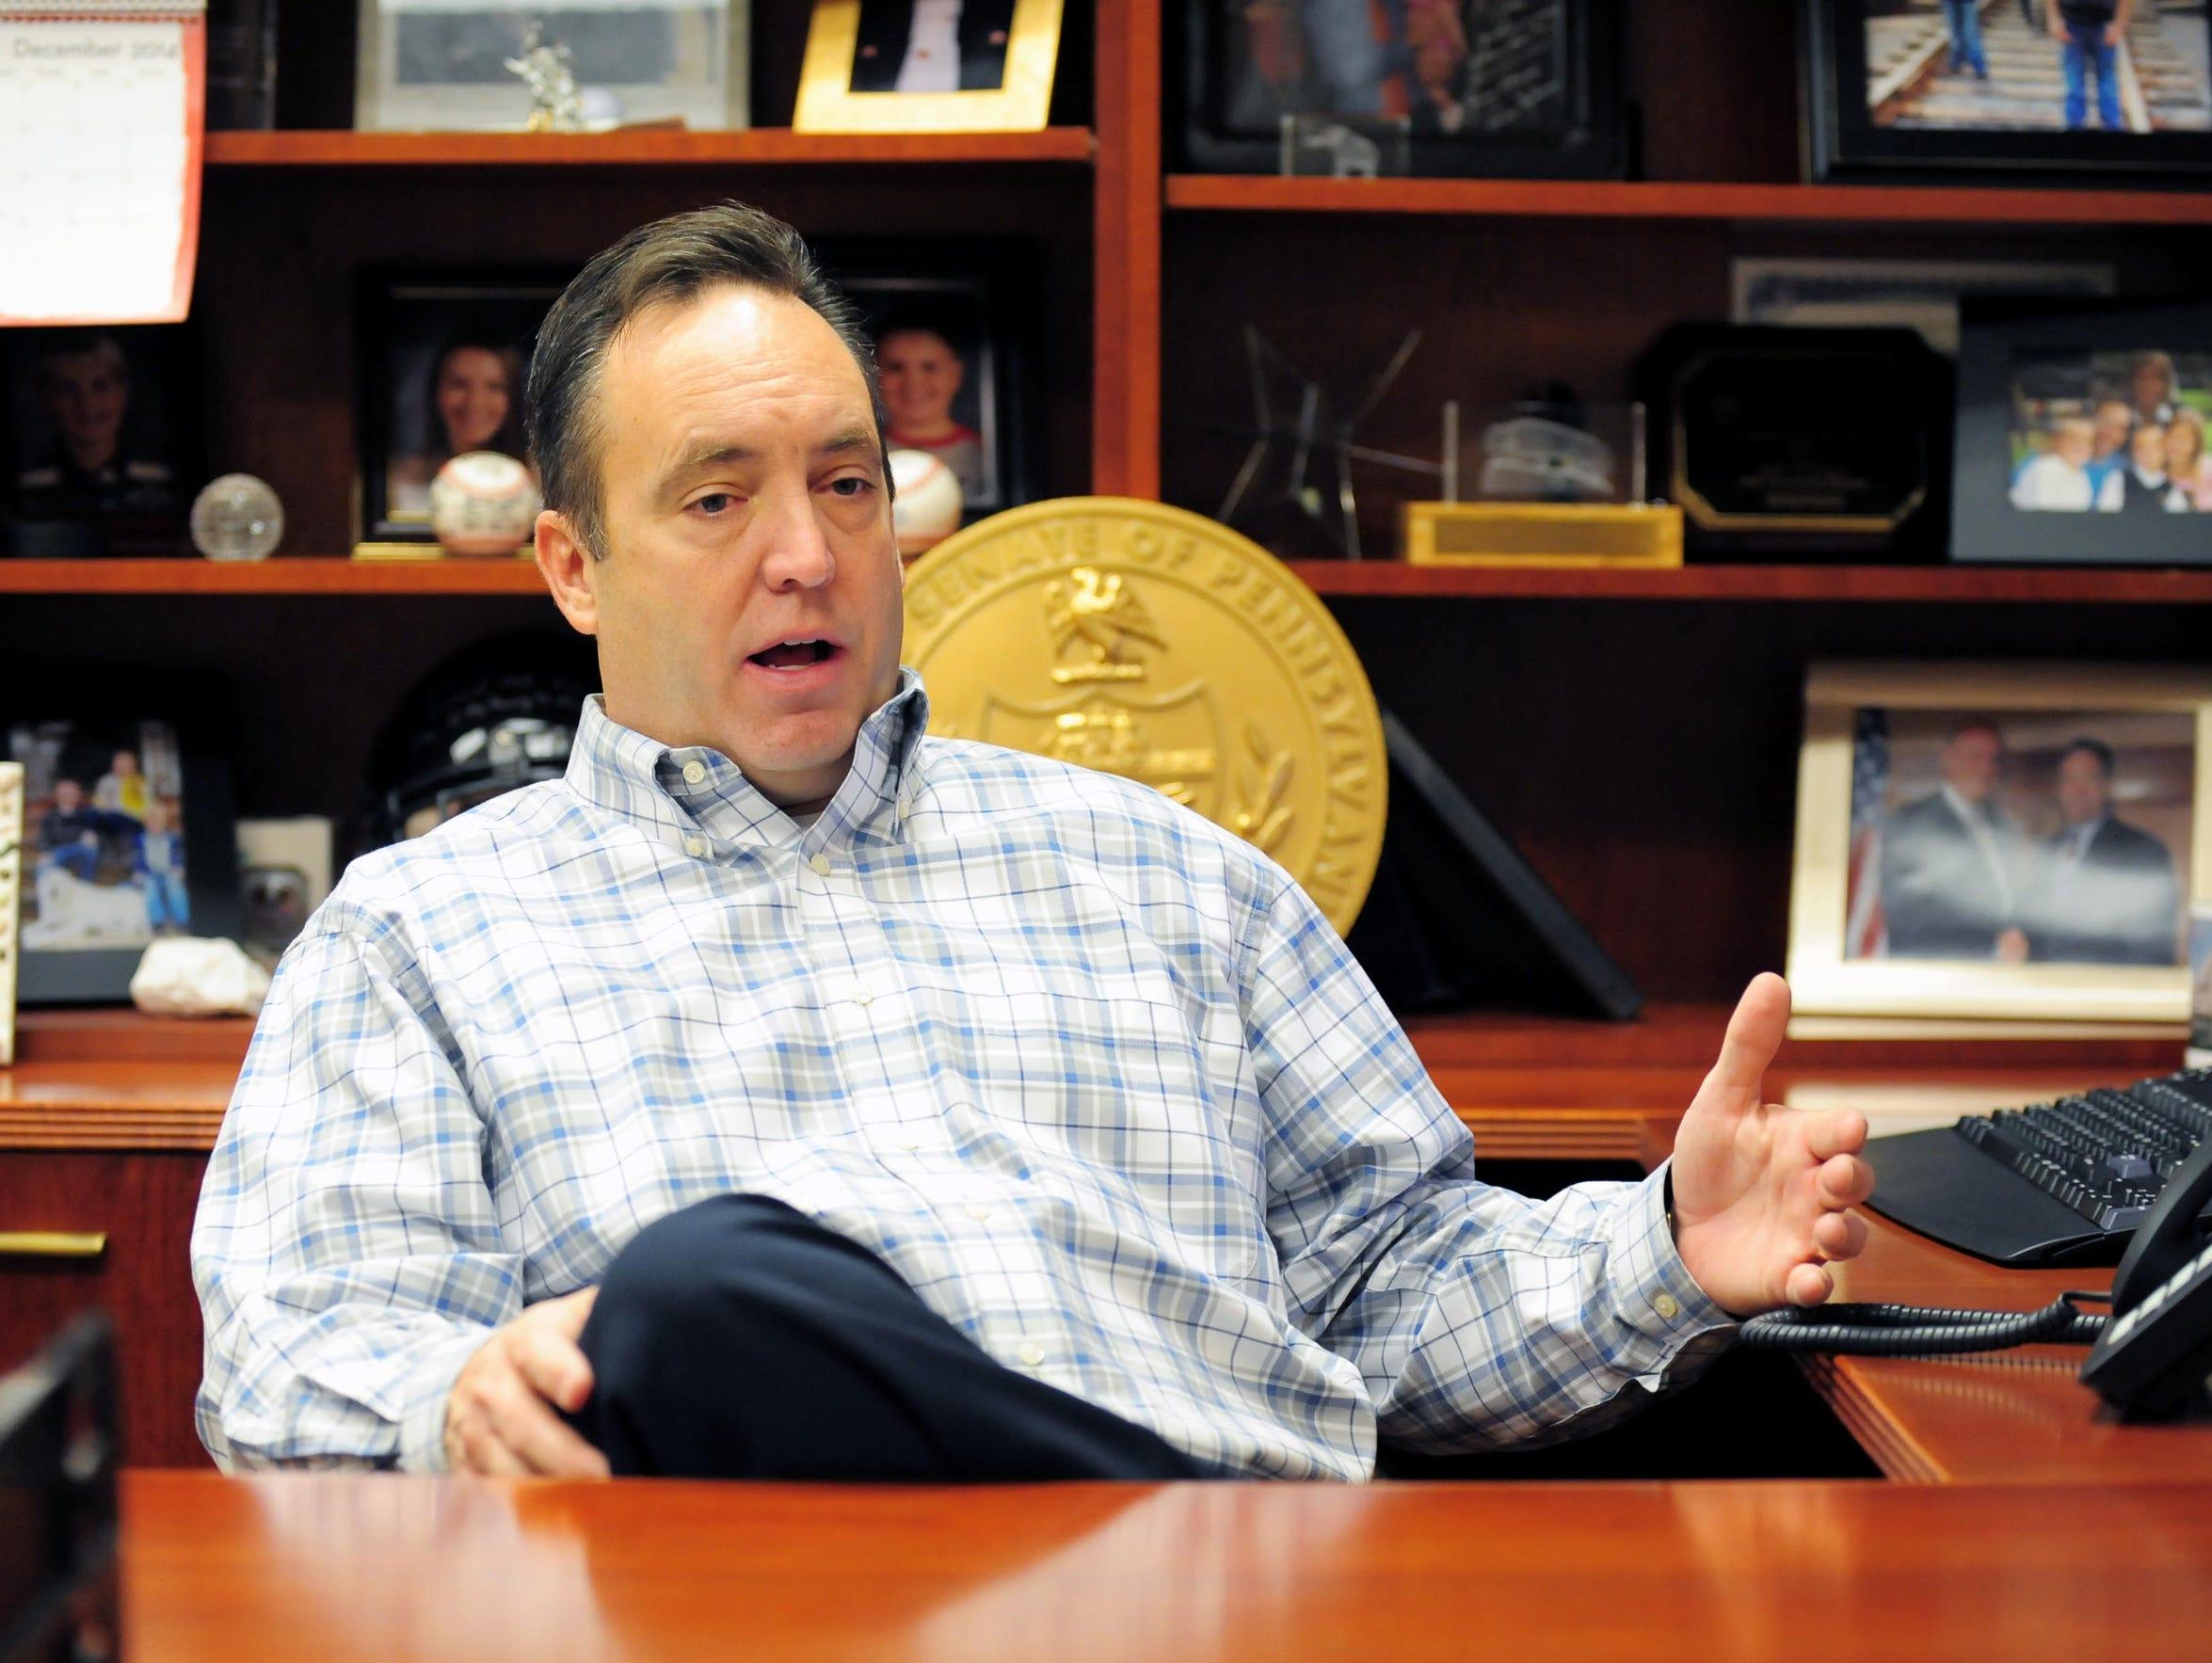 Pennsylvania state Senator Jake Corman is  challenging